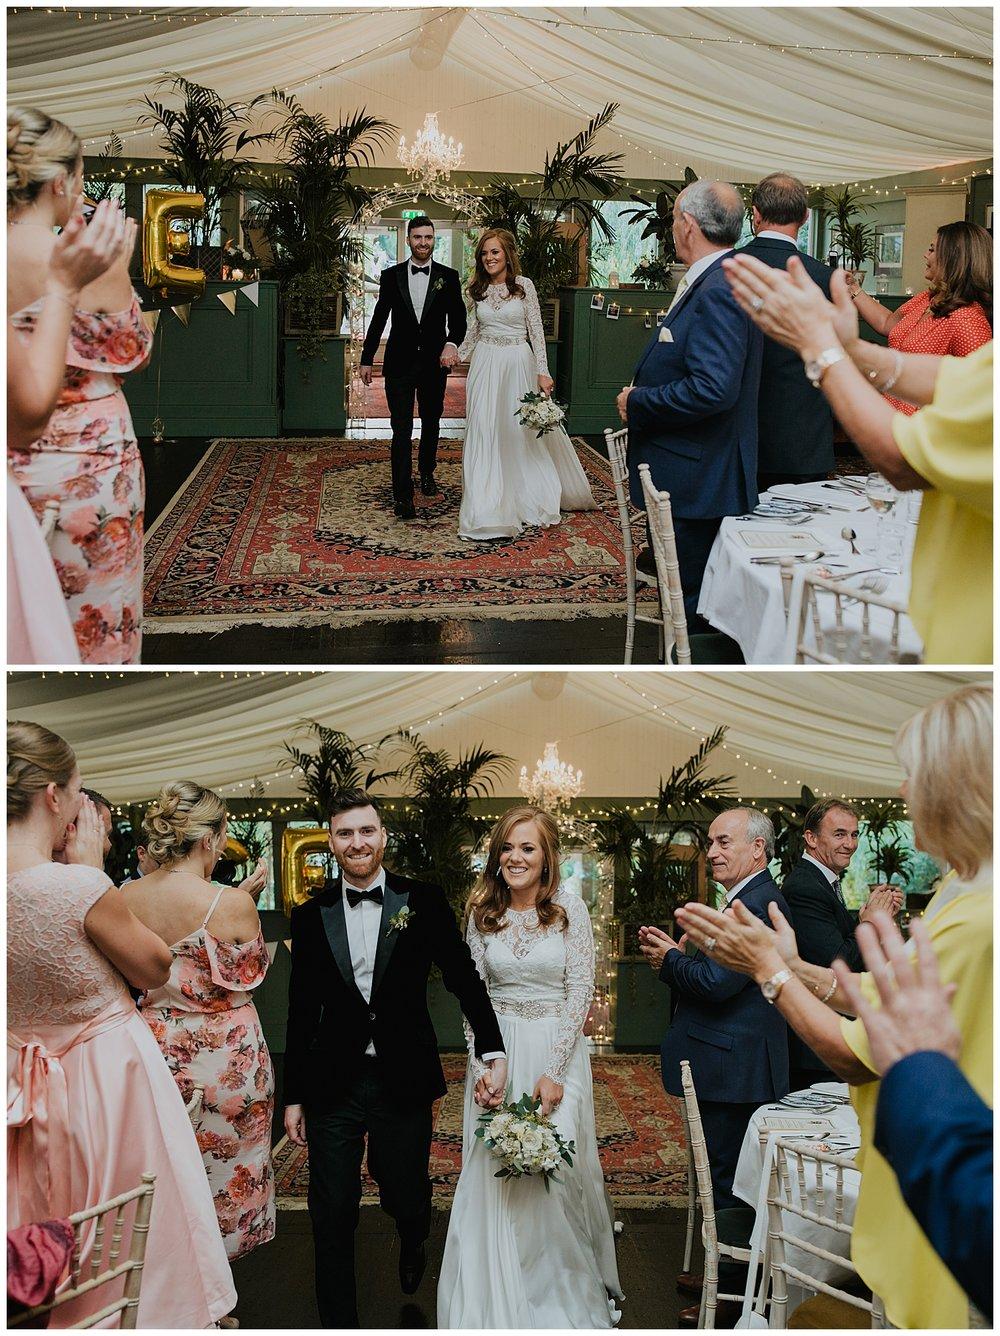 a&c_tinakilly_black_tie_wedding_photographer_livia_figueiredo_216.jpg